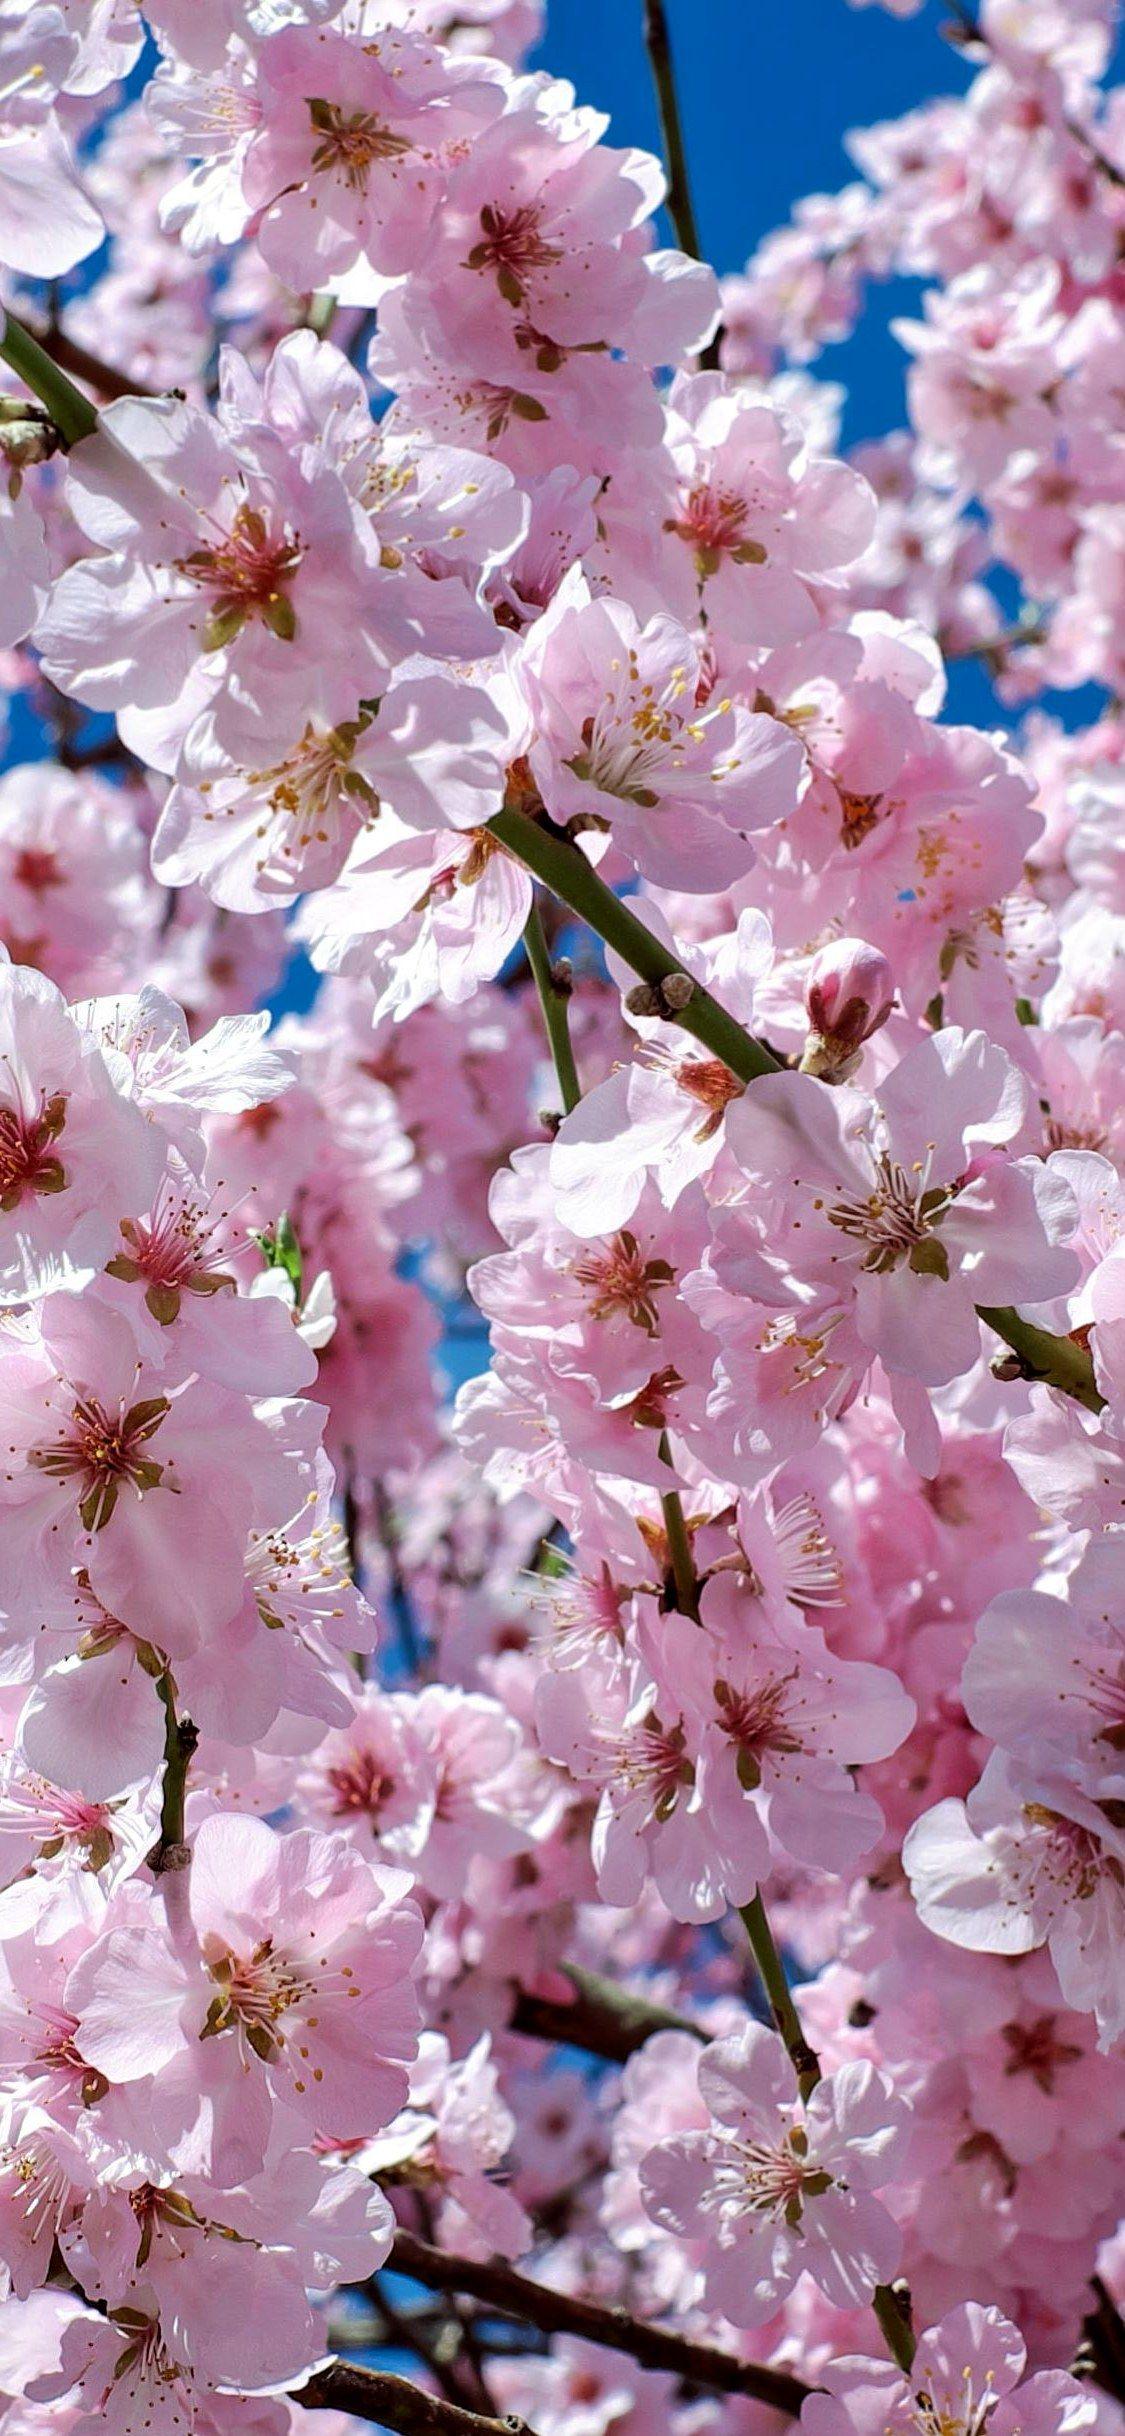 Japanese Cherry Trees Flowers Pink Tree Wallpaper Iphone X Wallpaper Japanese Cherry Tree Tree Wallpaper Iphone Pink Flowers Wallpaper